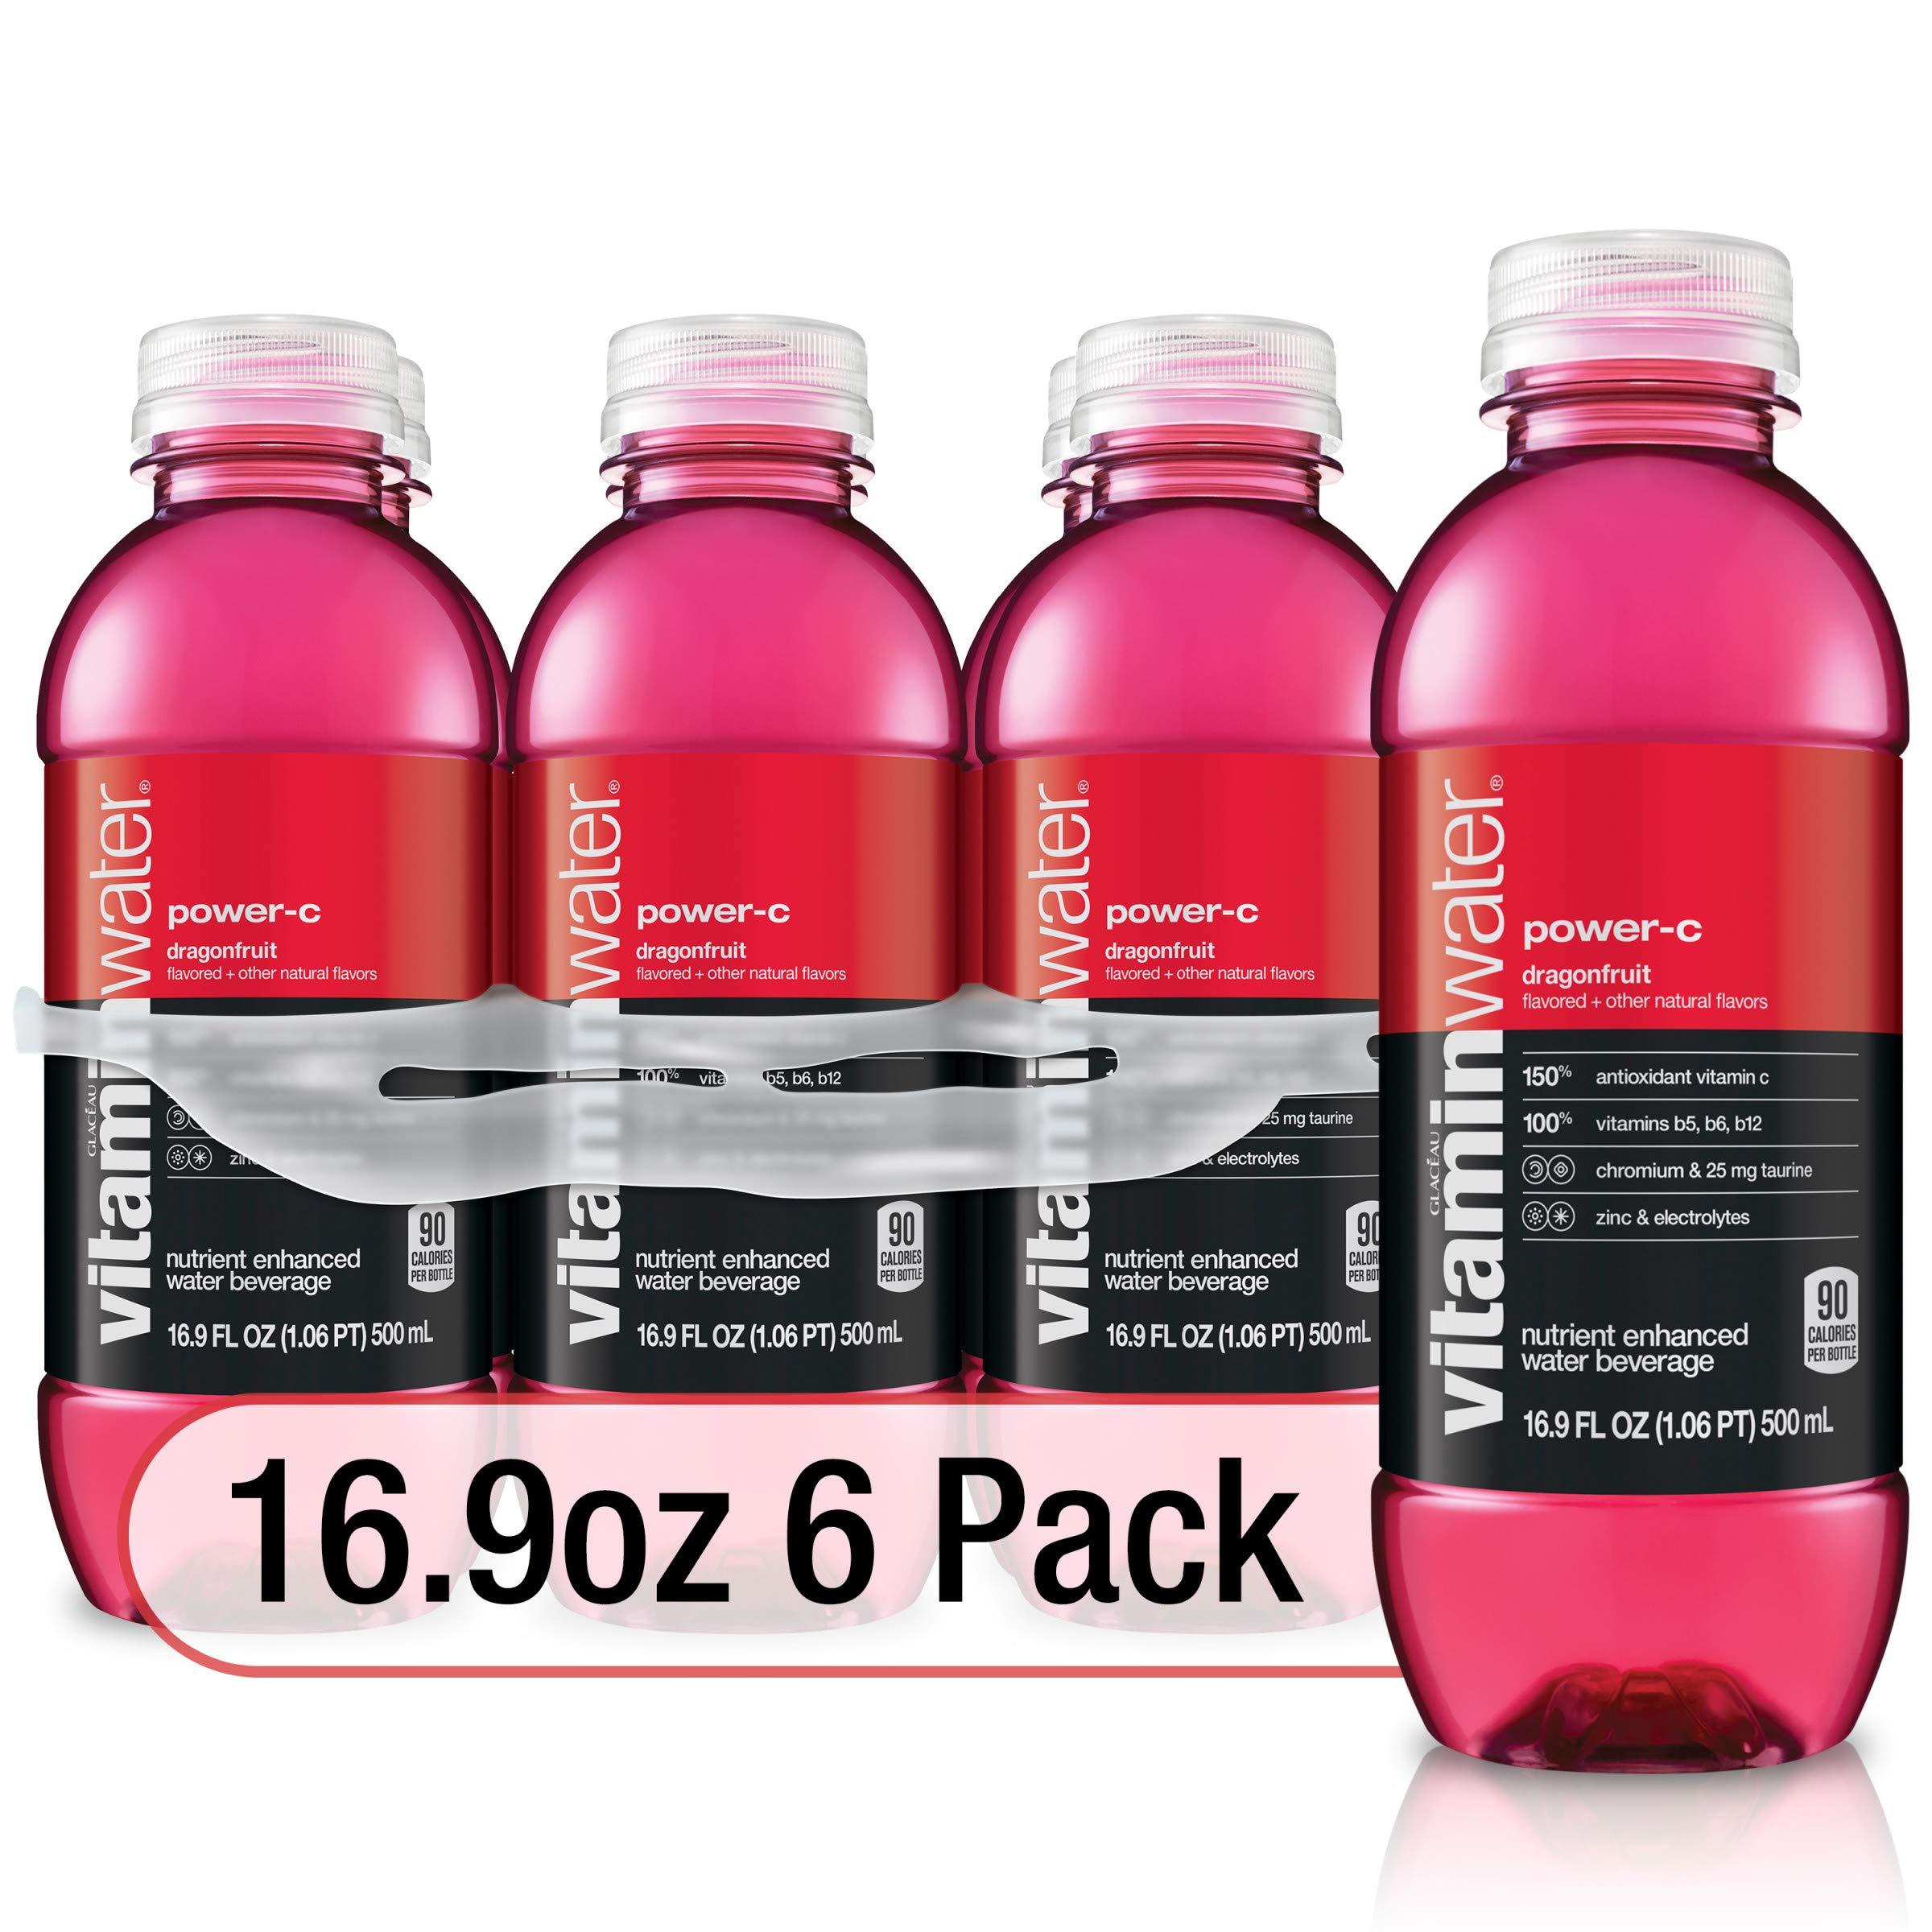 vitaminwater power-c electrolyte enhanced water w/ vitamins, dragonfruit drinks, 16.9 fl oz, 6 Pack